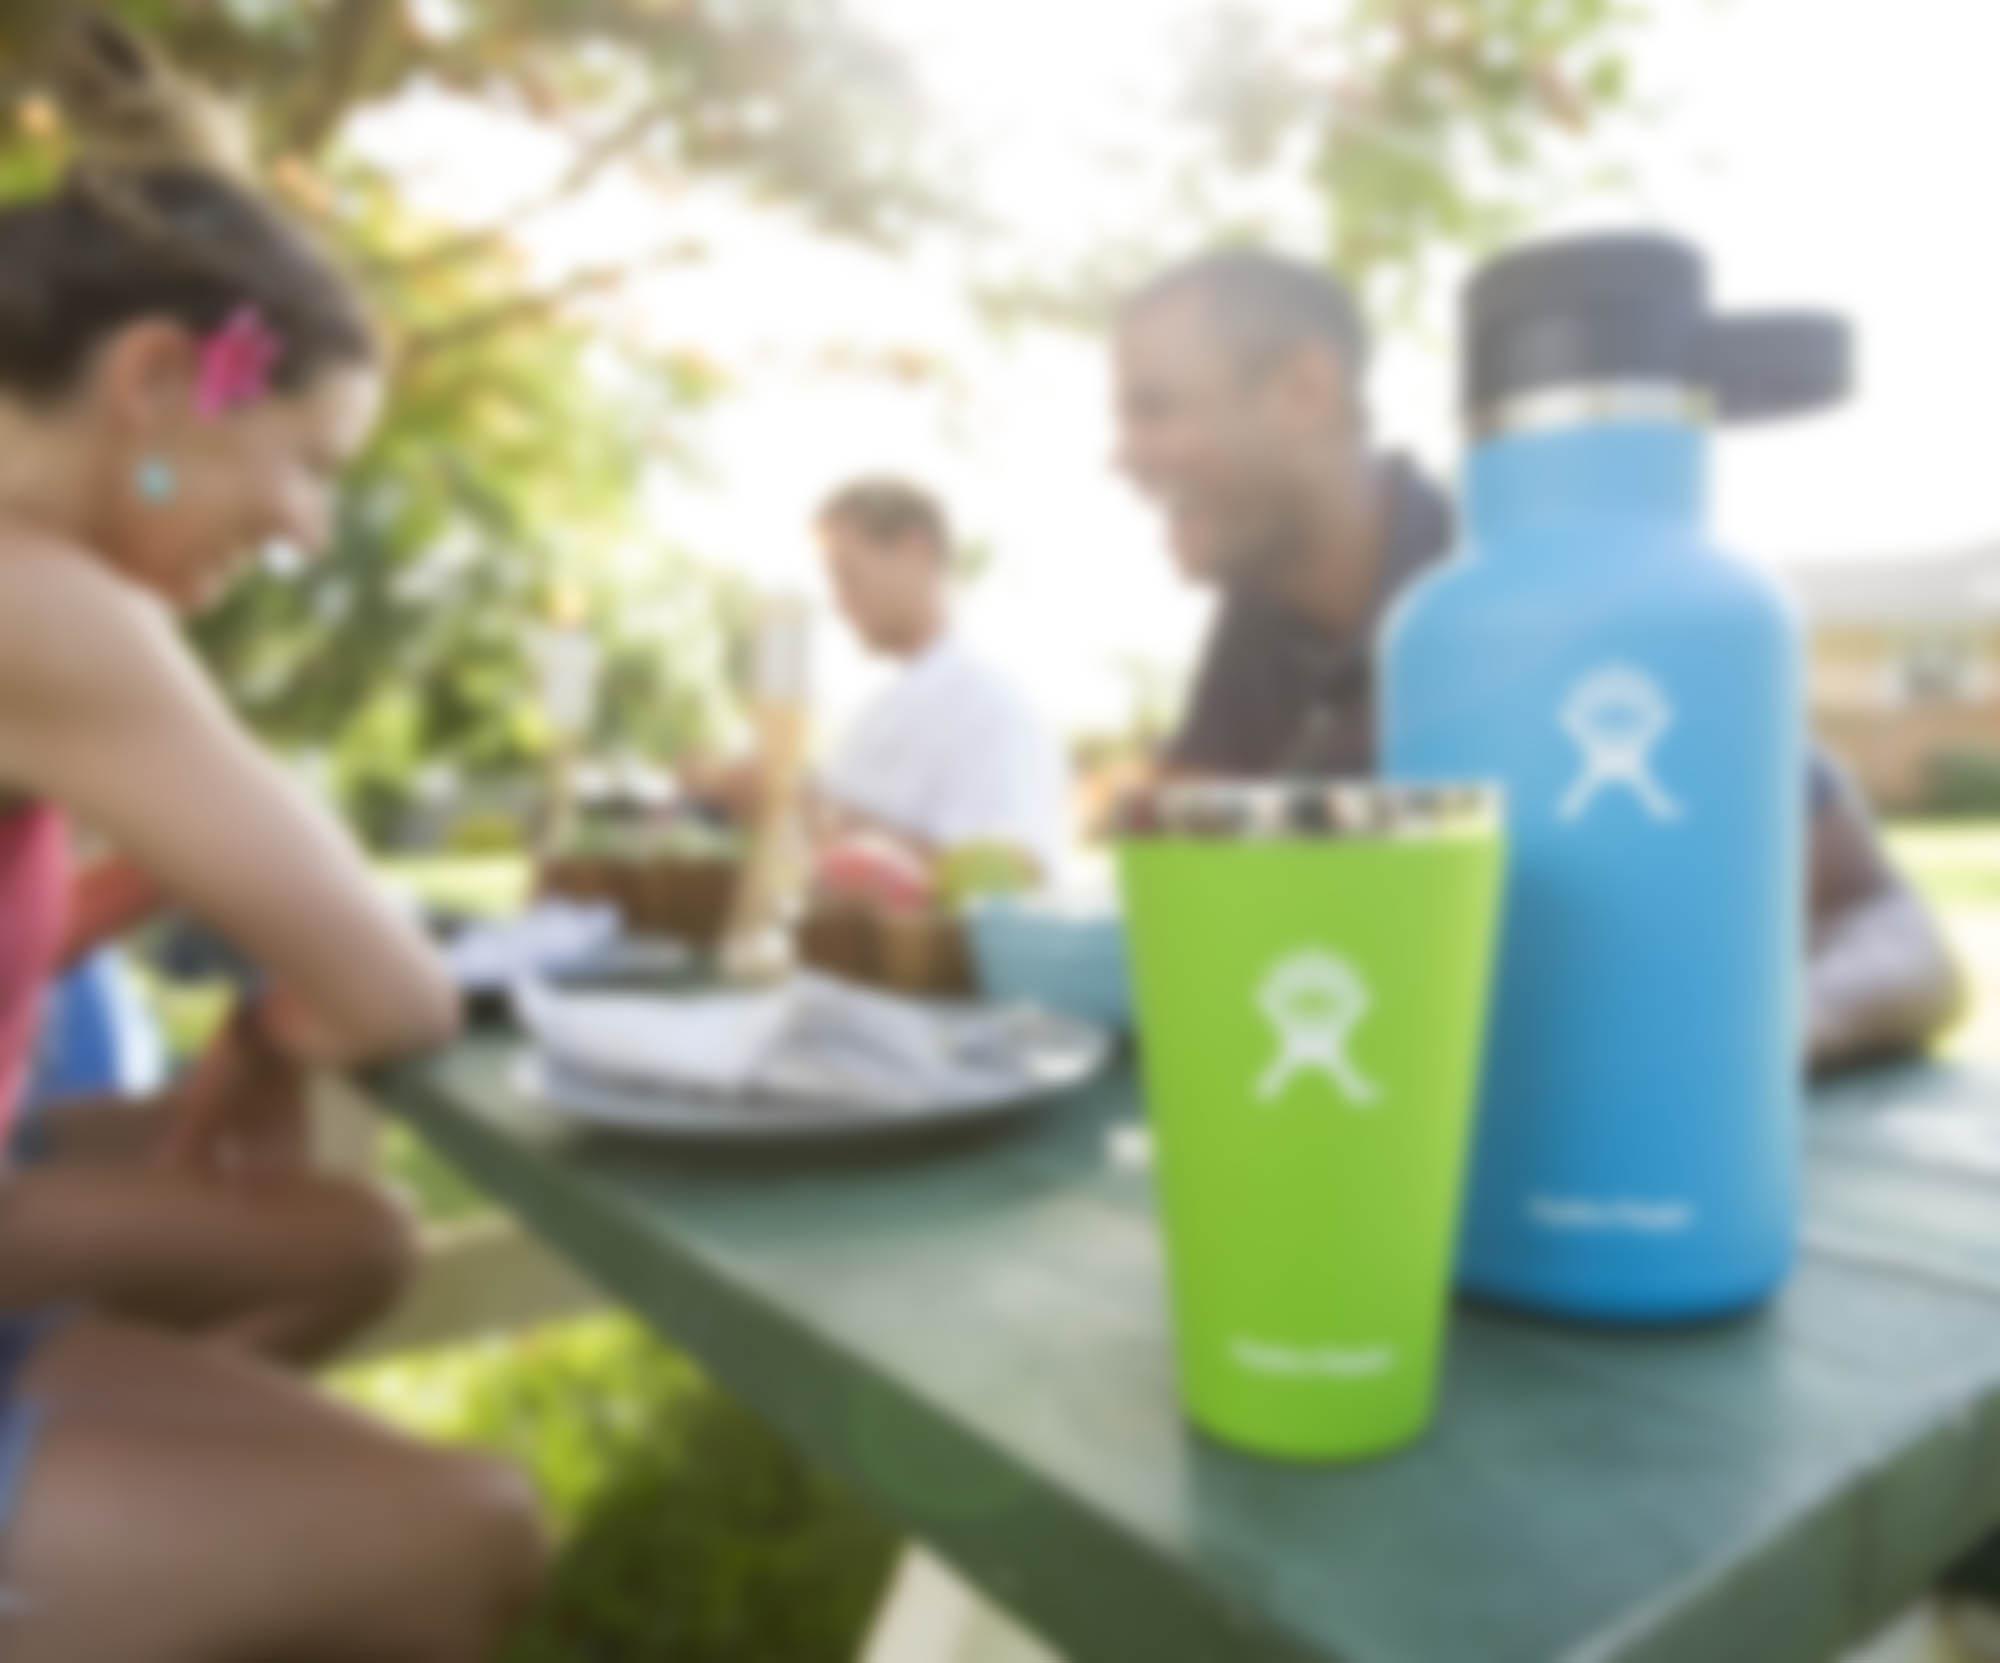 Hydro Flask Growlers - blurry